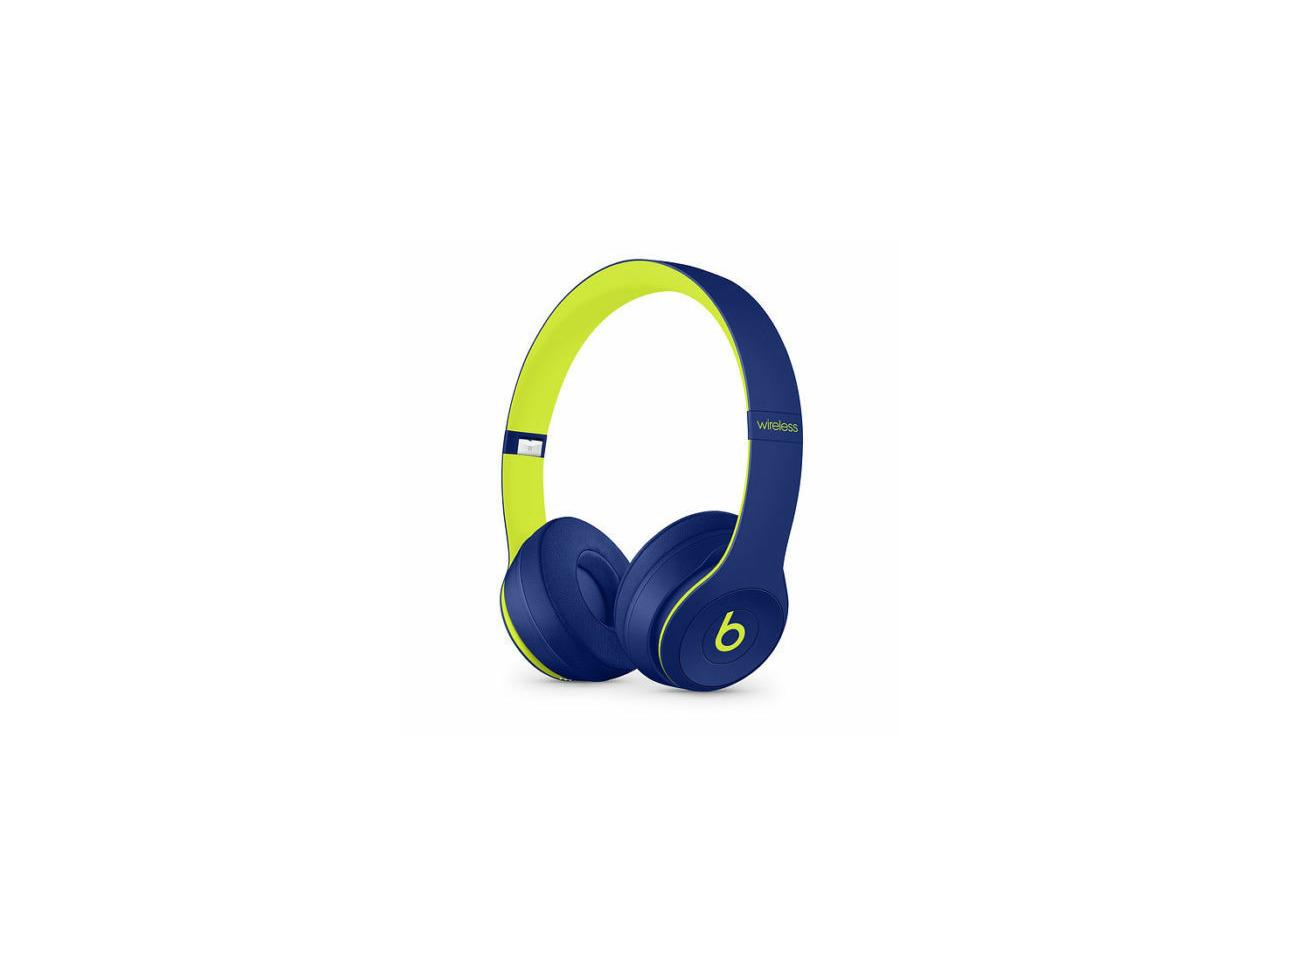 ebafac333c3 Buy Beats Solo3 Wireless On-Ear Headphones – Beats Pop Collection – Pop  Indigo | Fat Llama